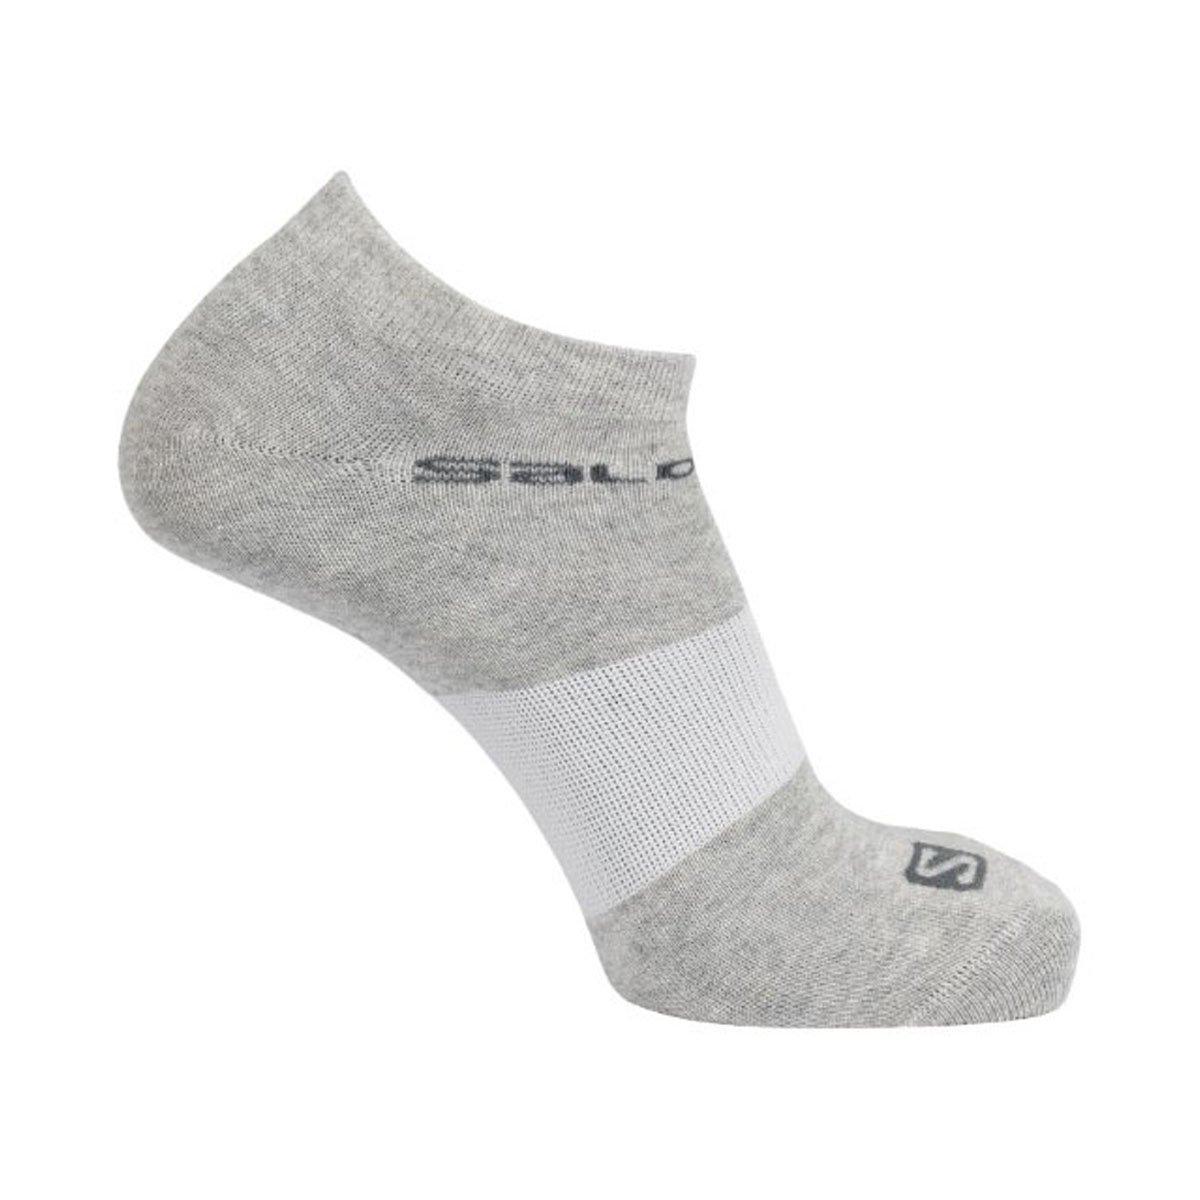 Носки Salomon FESTIVAL 2-PACK серые L